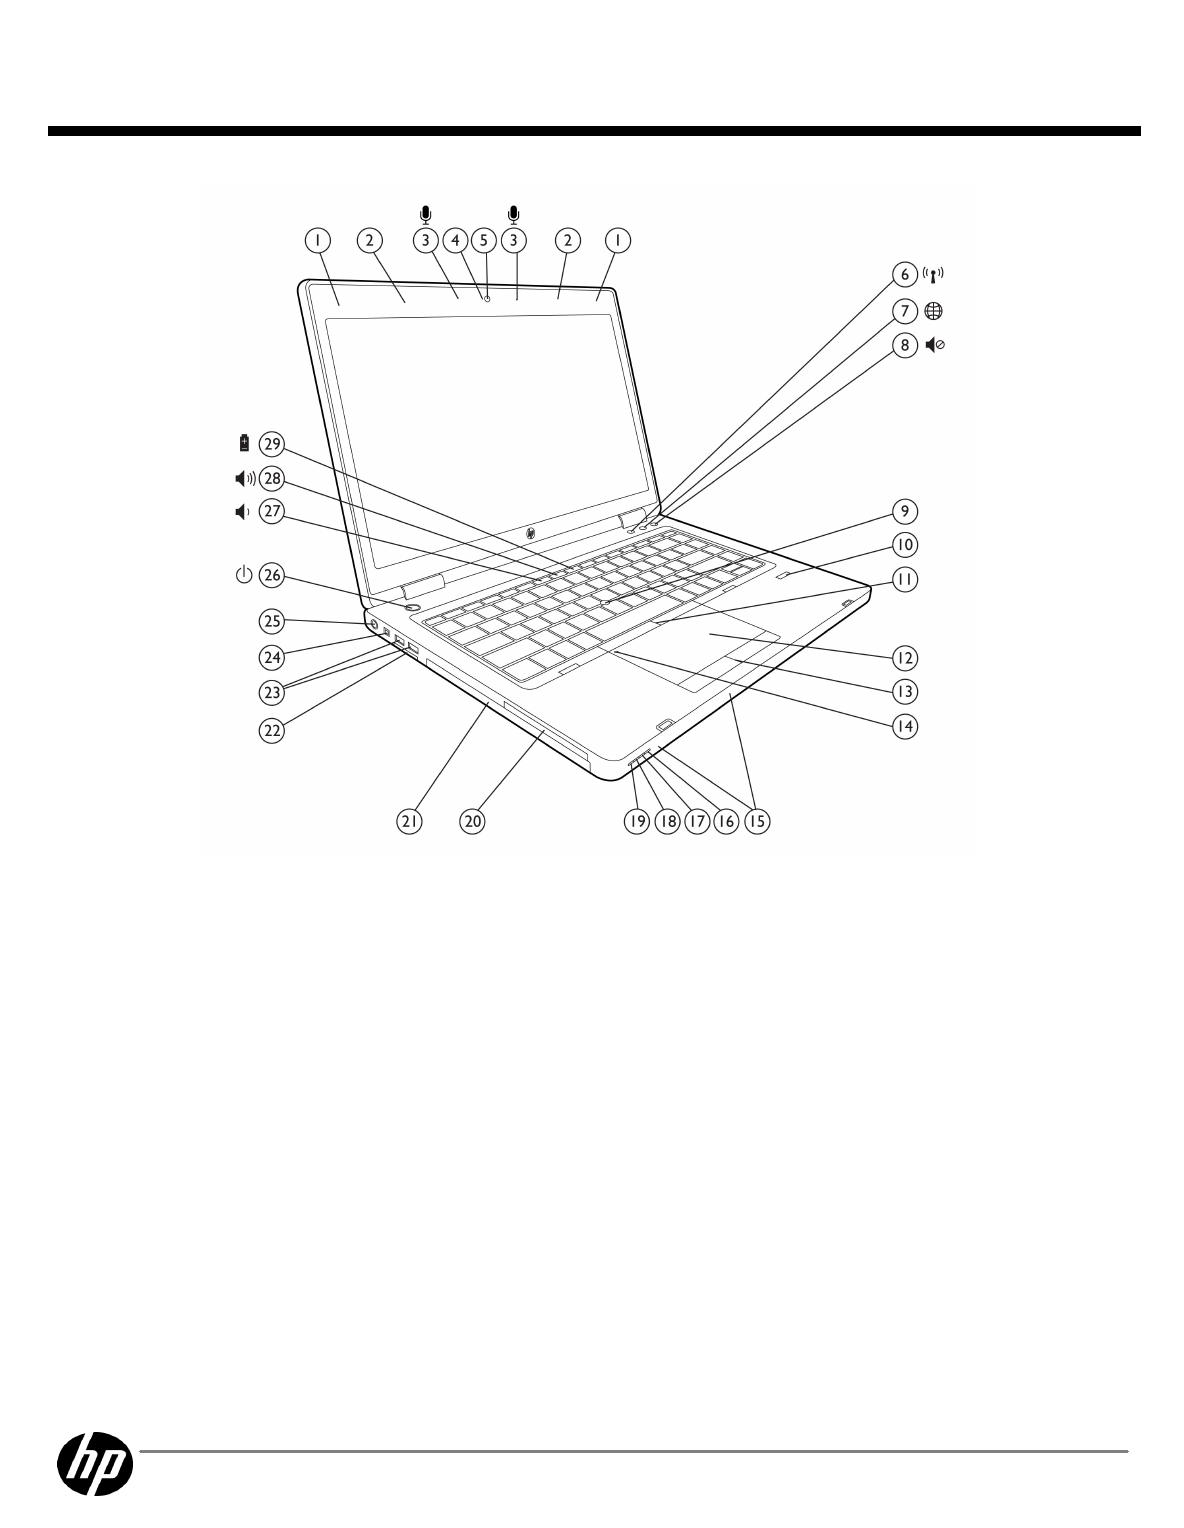 QuickSpecs HP ProBook 6360b Notebook PC